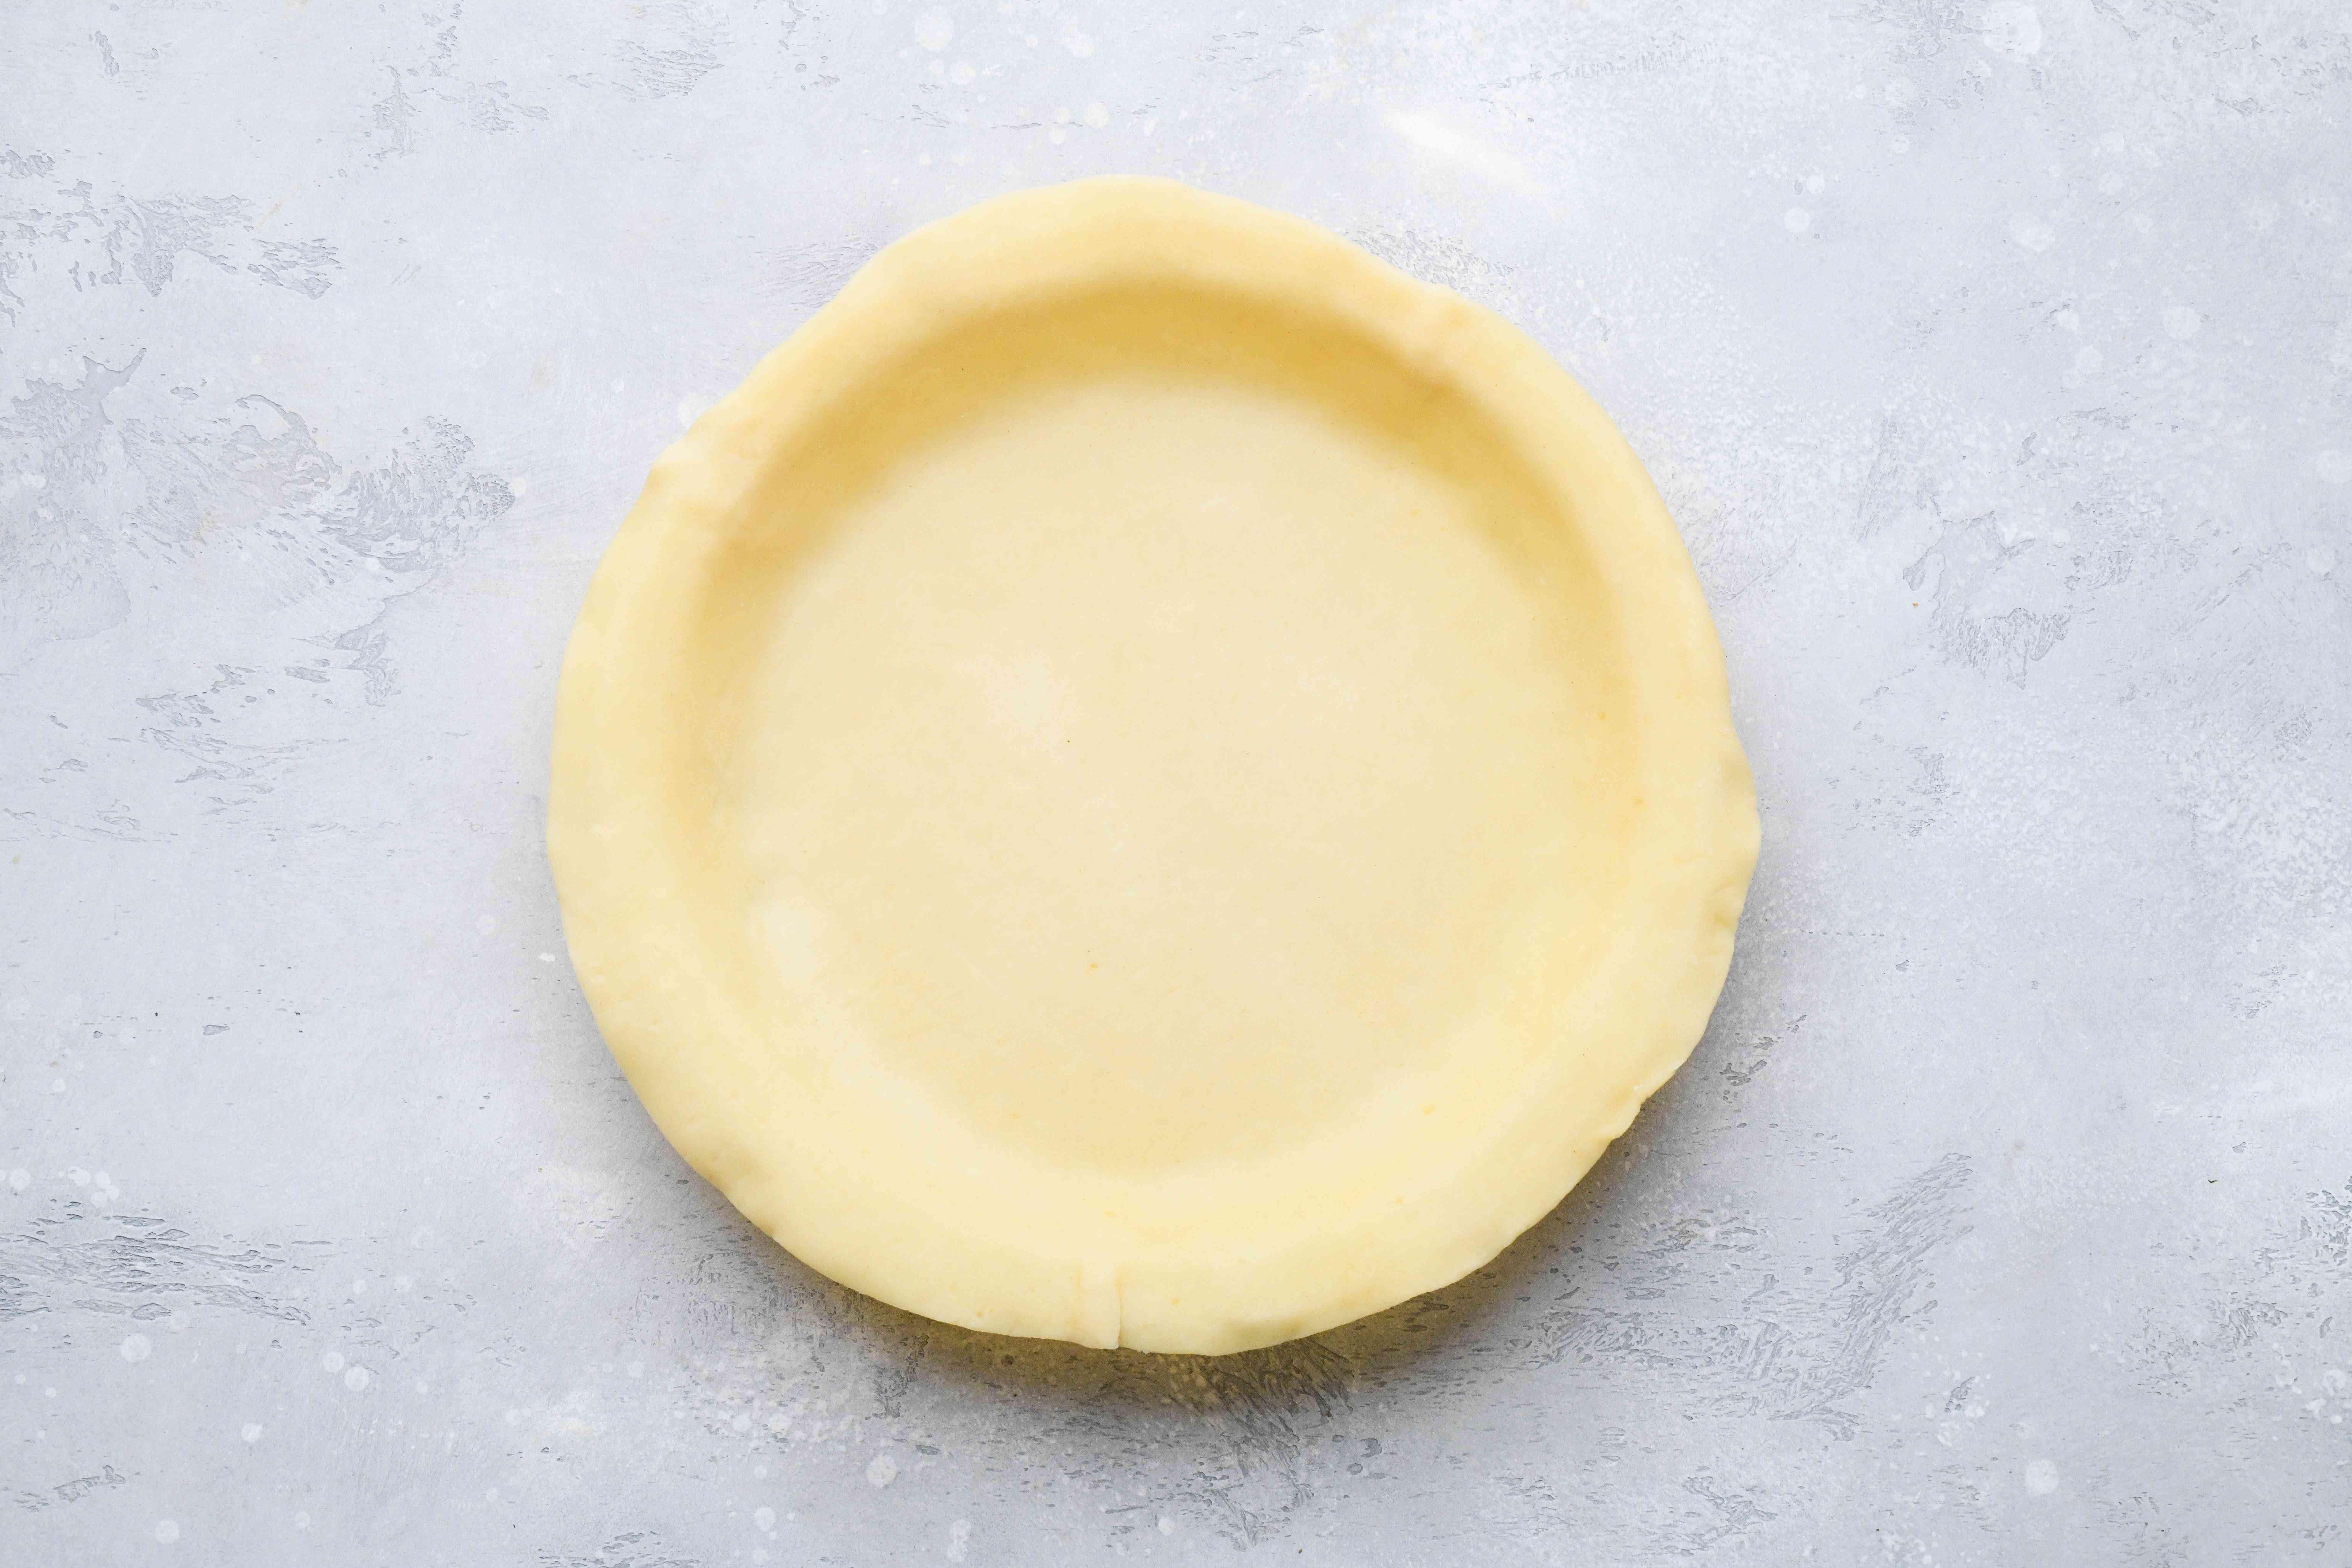 pie crust in a pie pan